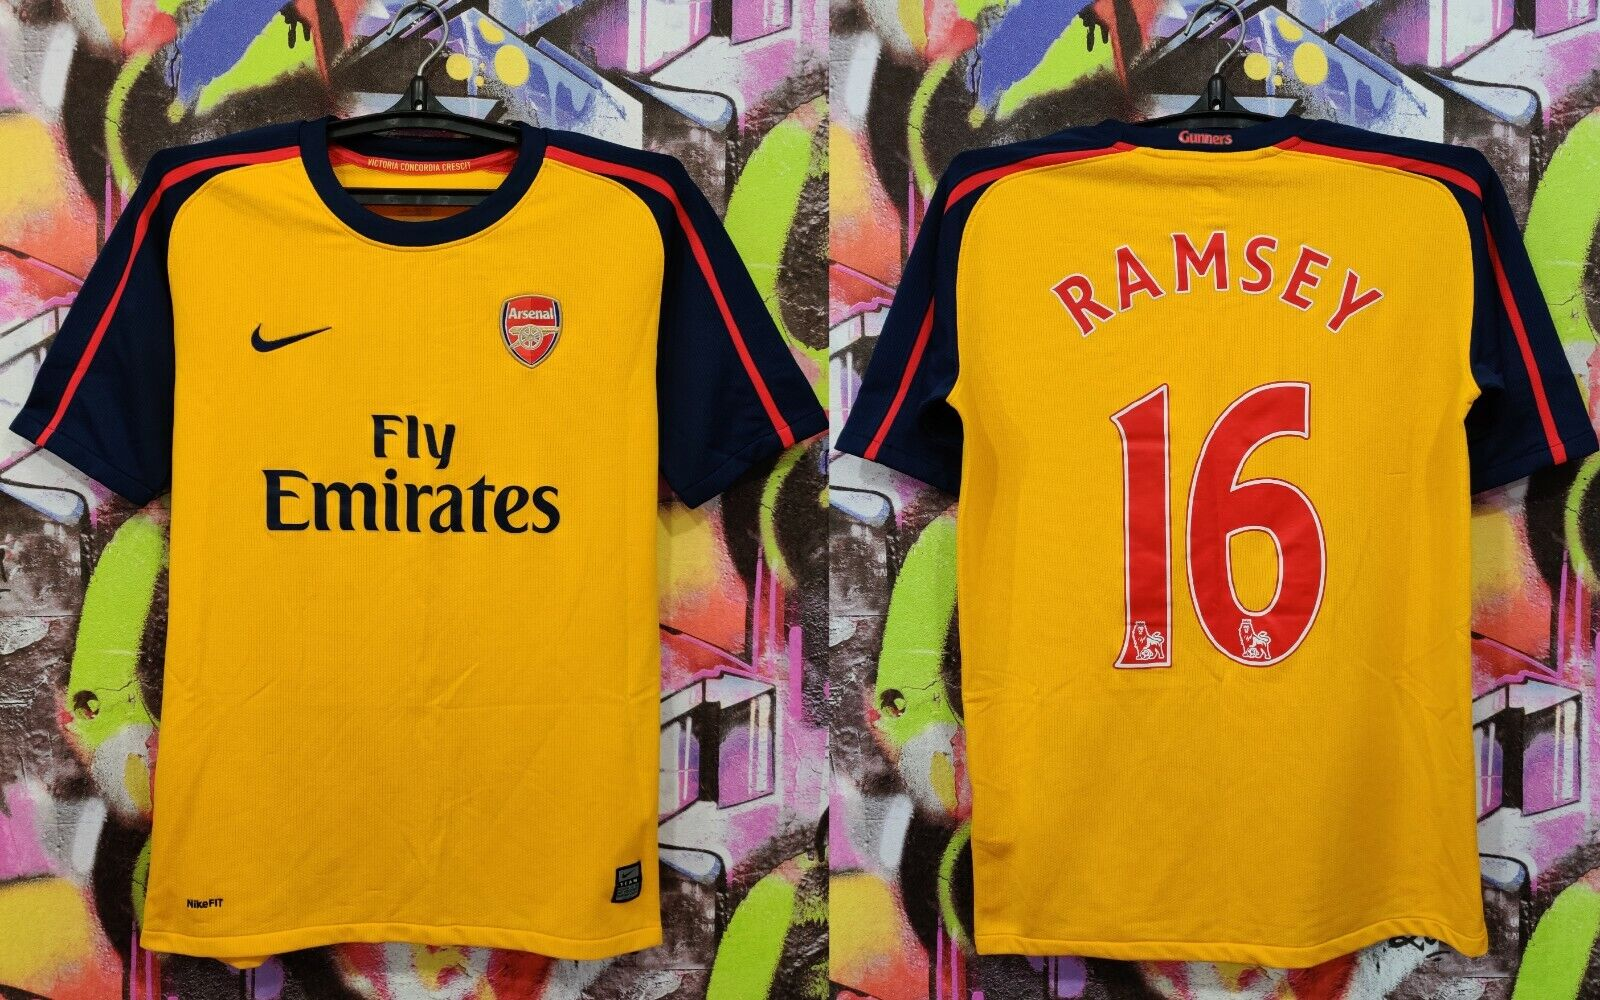 Aaron Ramsey Arsenal Home Jersey